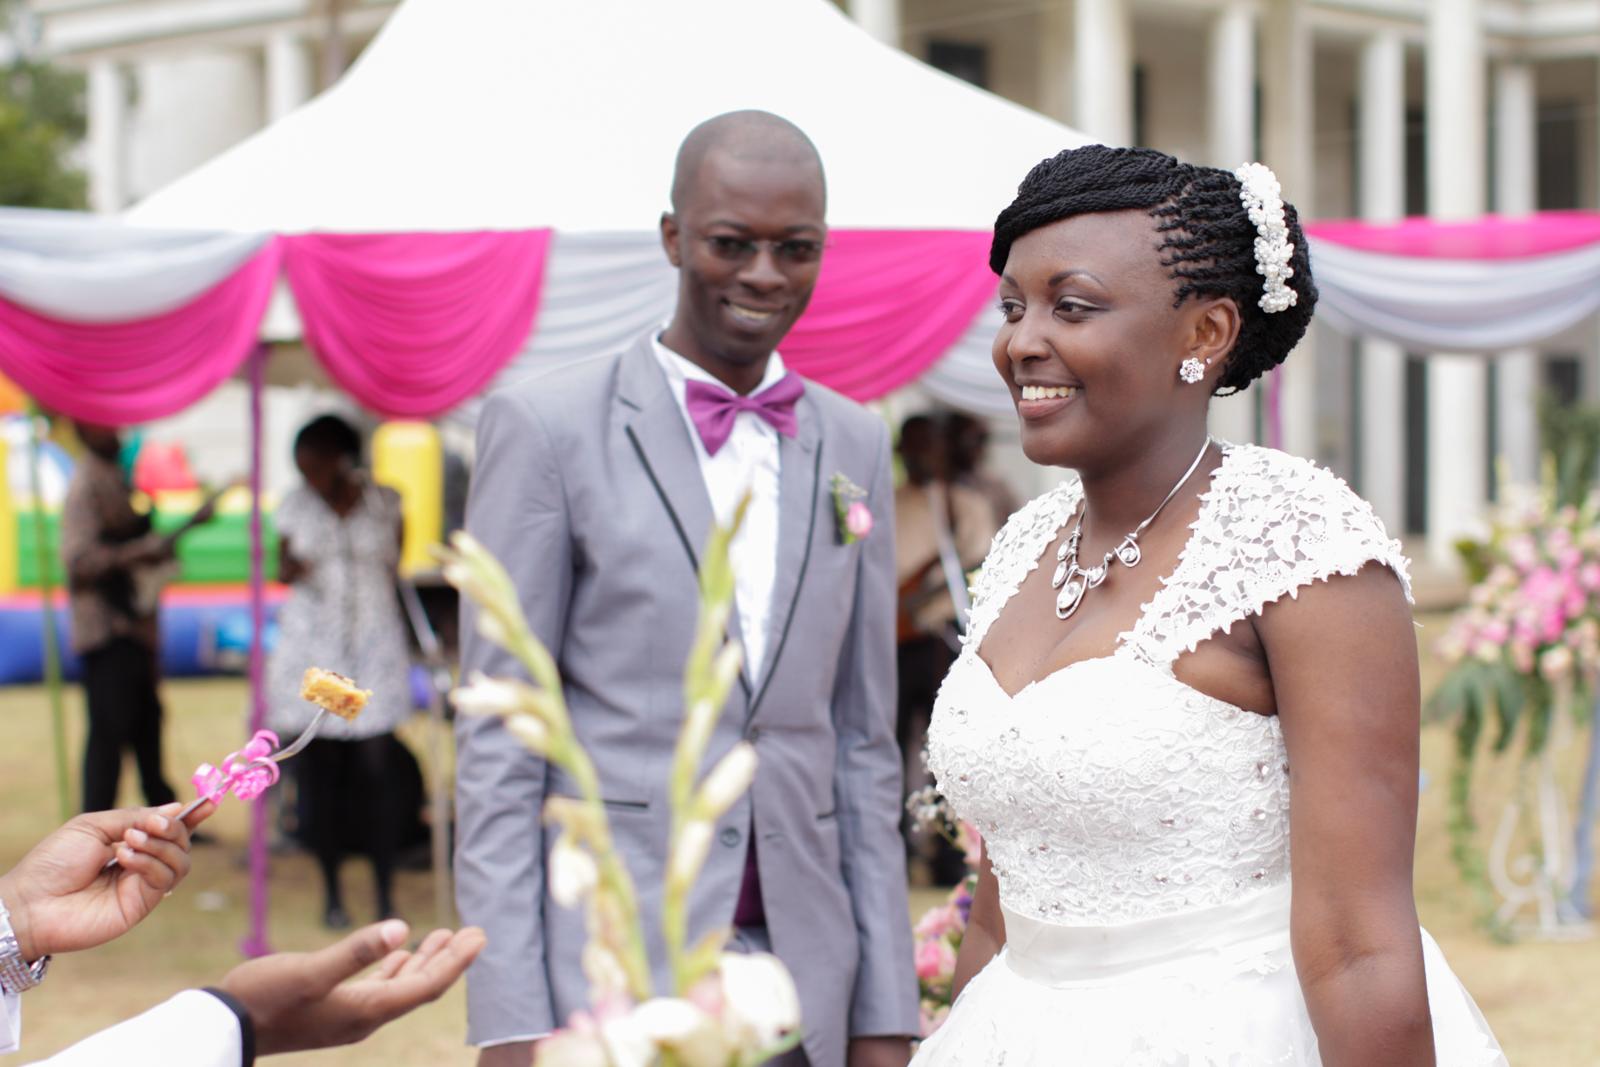 Kenyan wedding photographer Best Nairobi Weddings –Top Kenyan Wedding Photographers – Top Kenyan Weddings –Top Nairobi Wedding Photographers –Best Kenyan Wedding Photographers –Best Nairobi Wedding Photography-